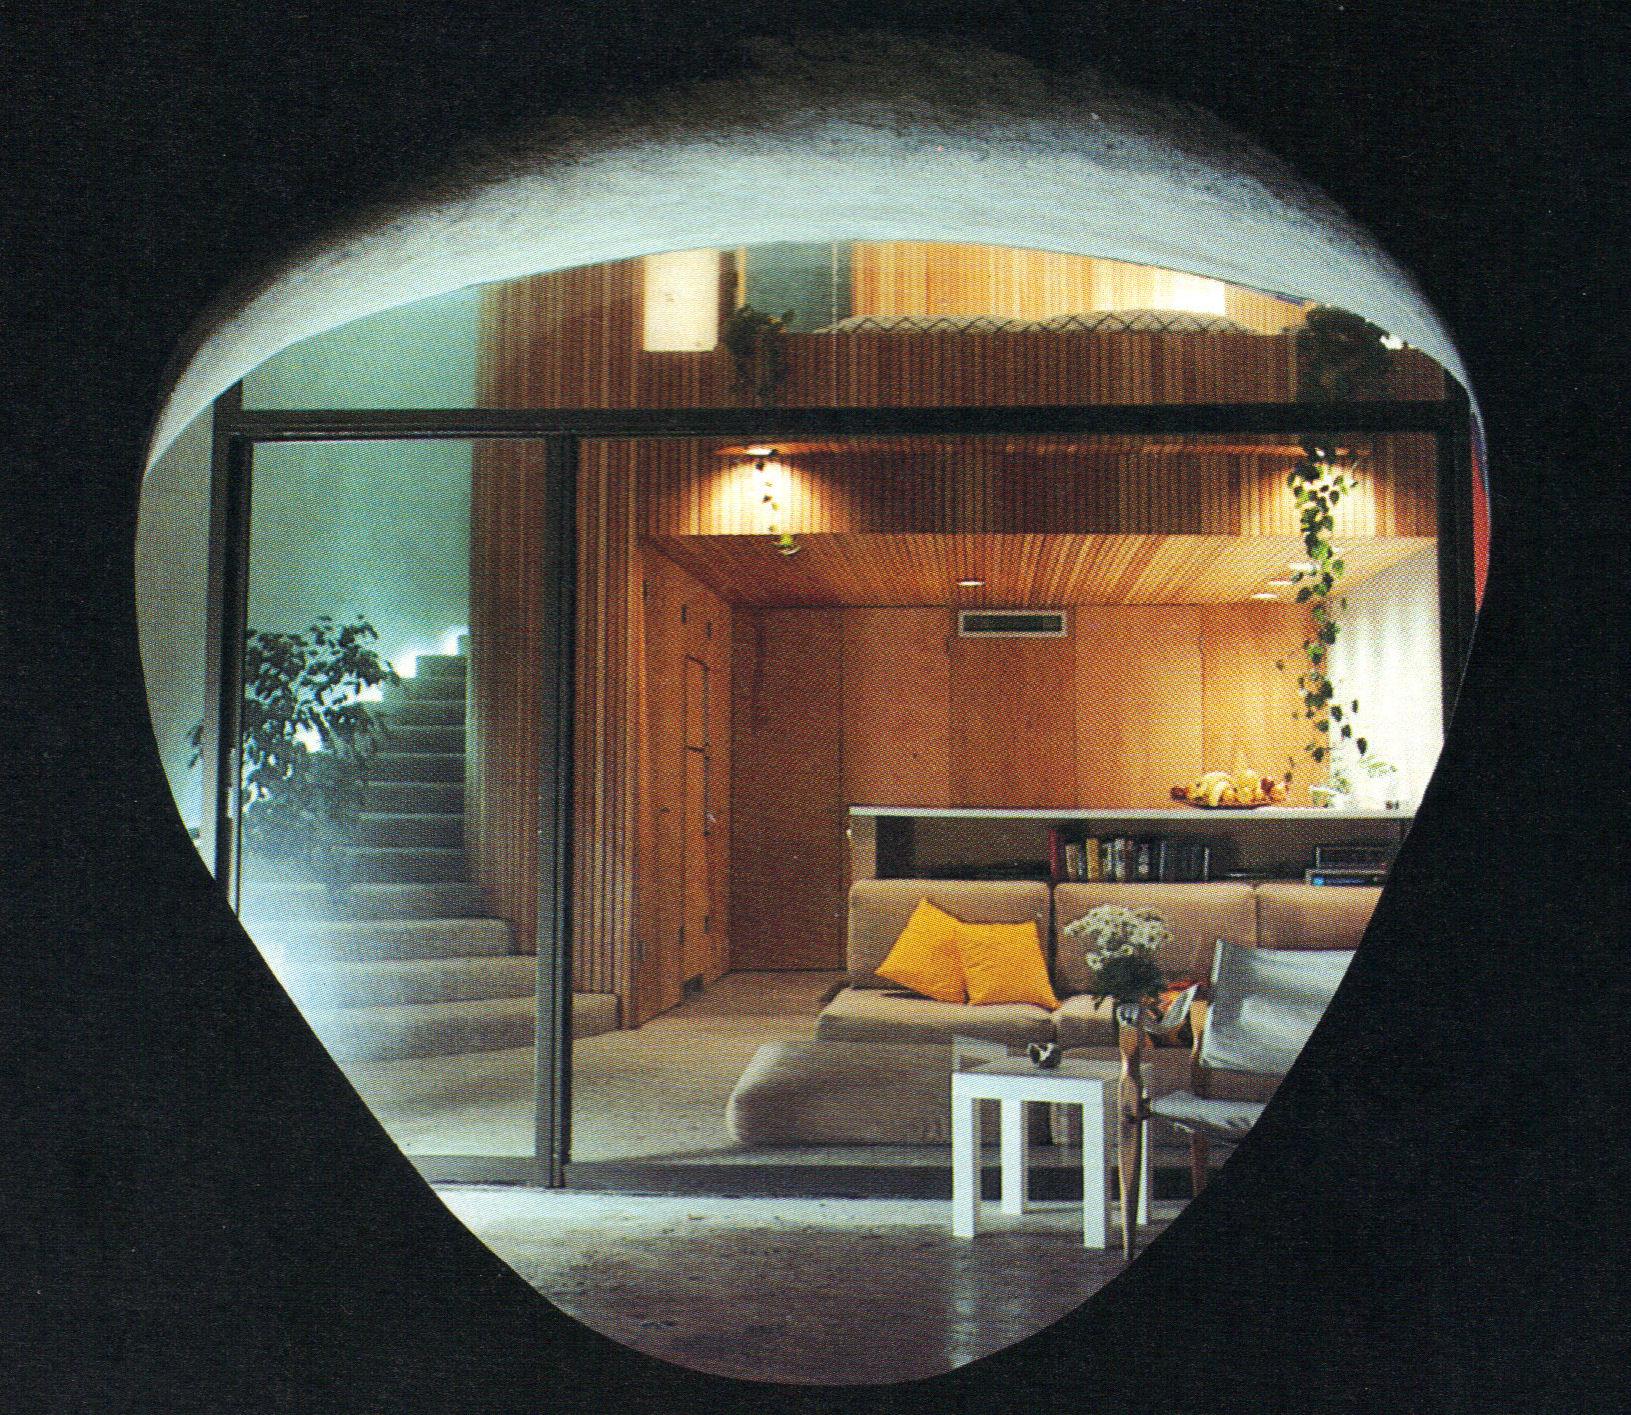 dune_house_just3dscom_13